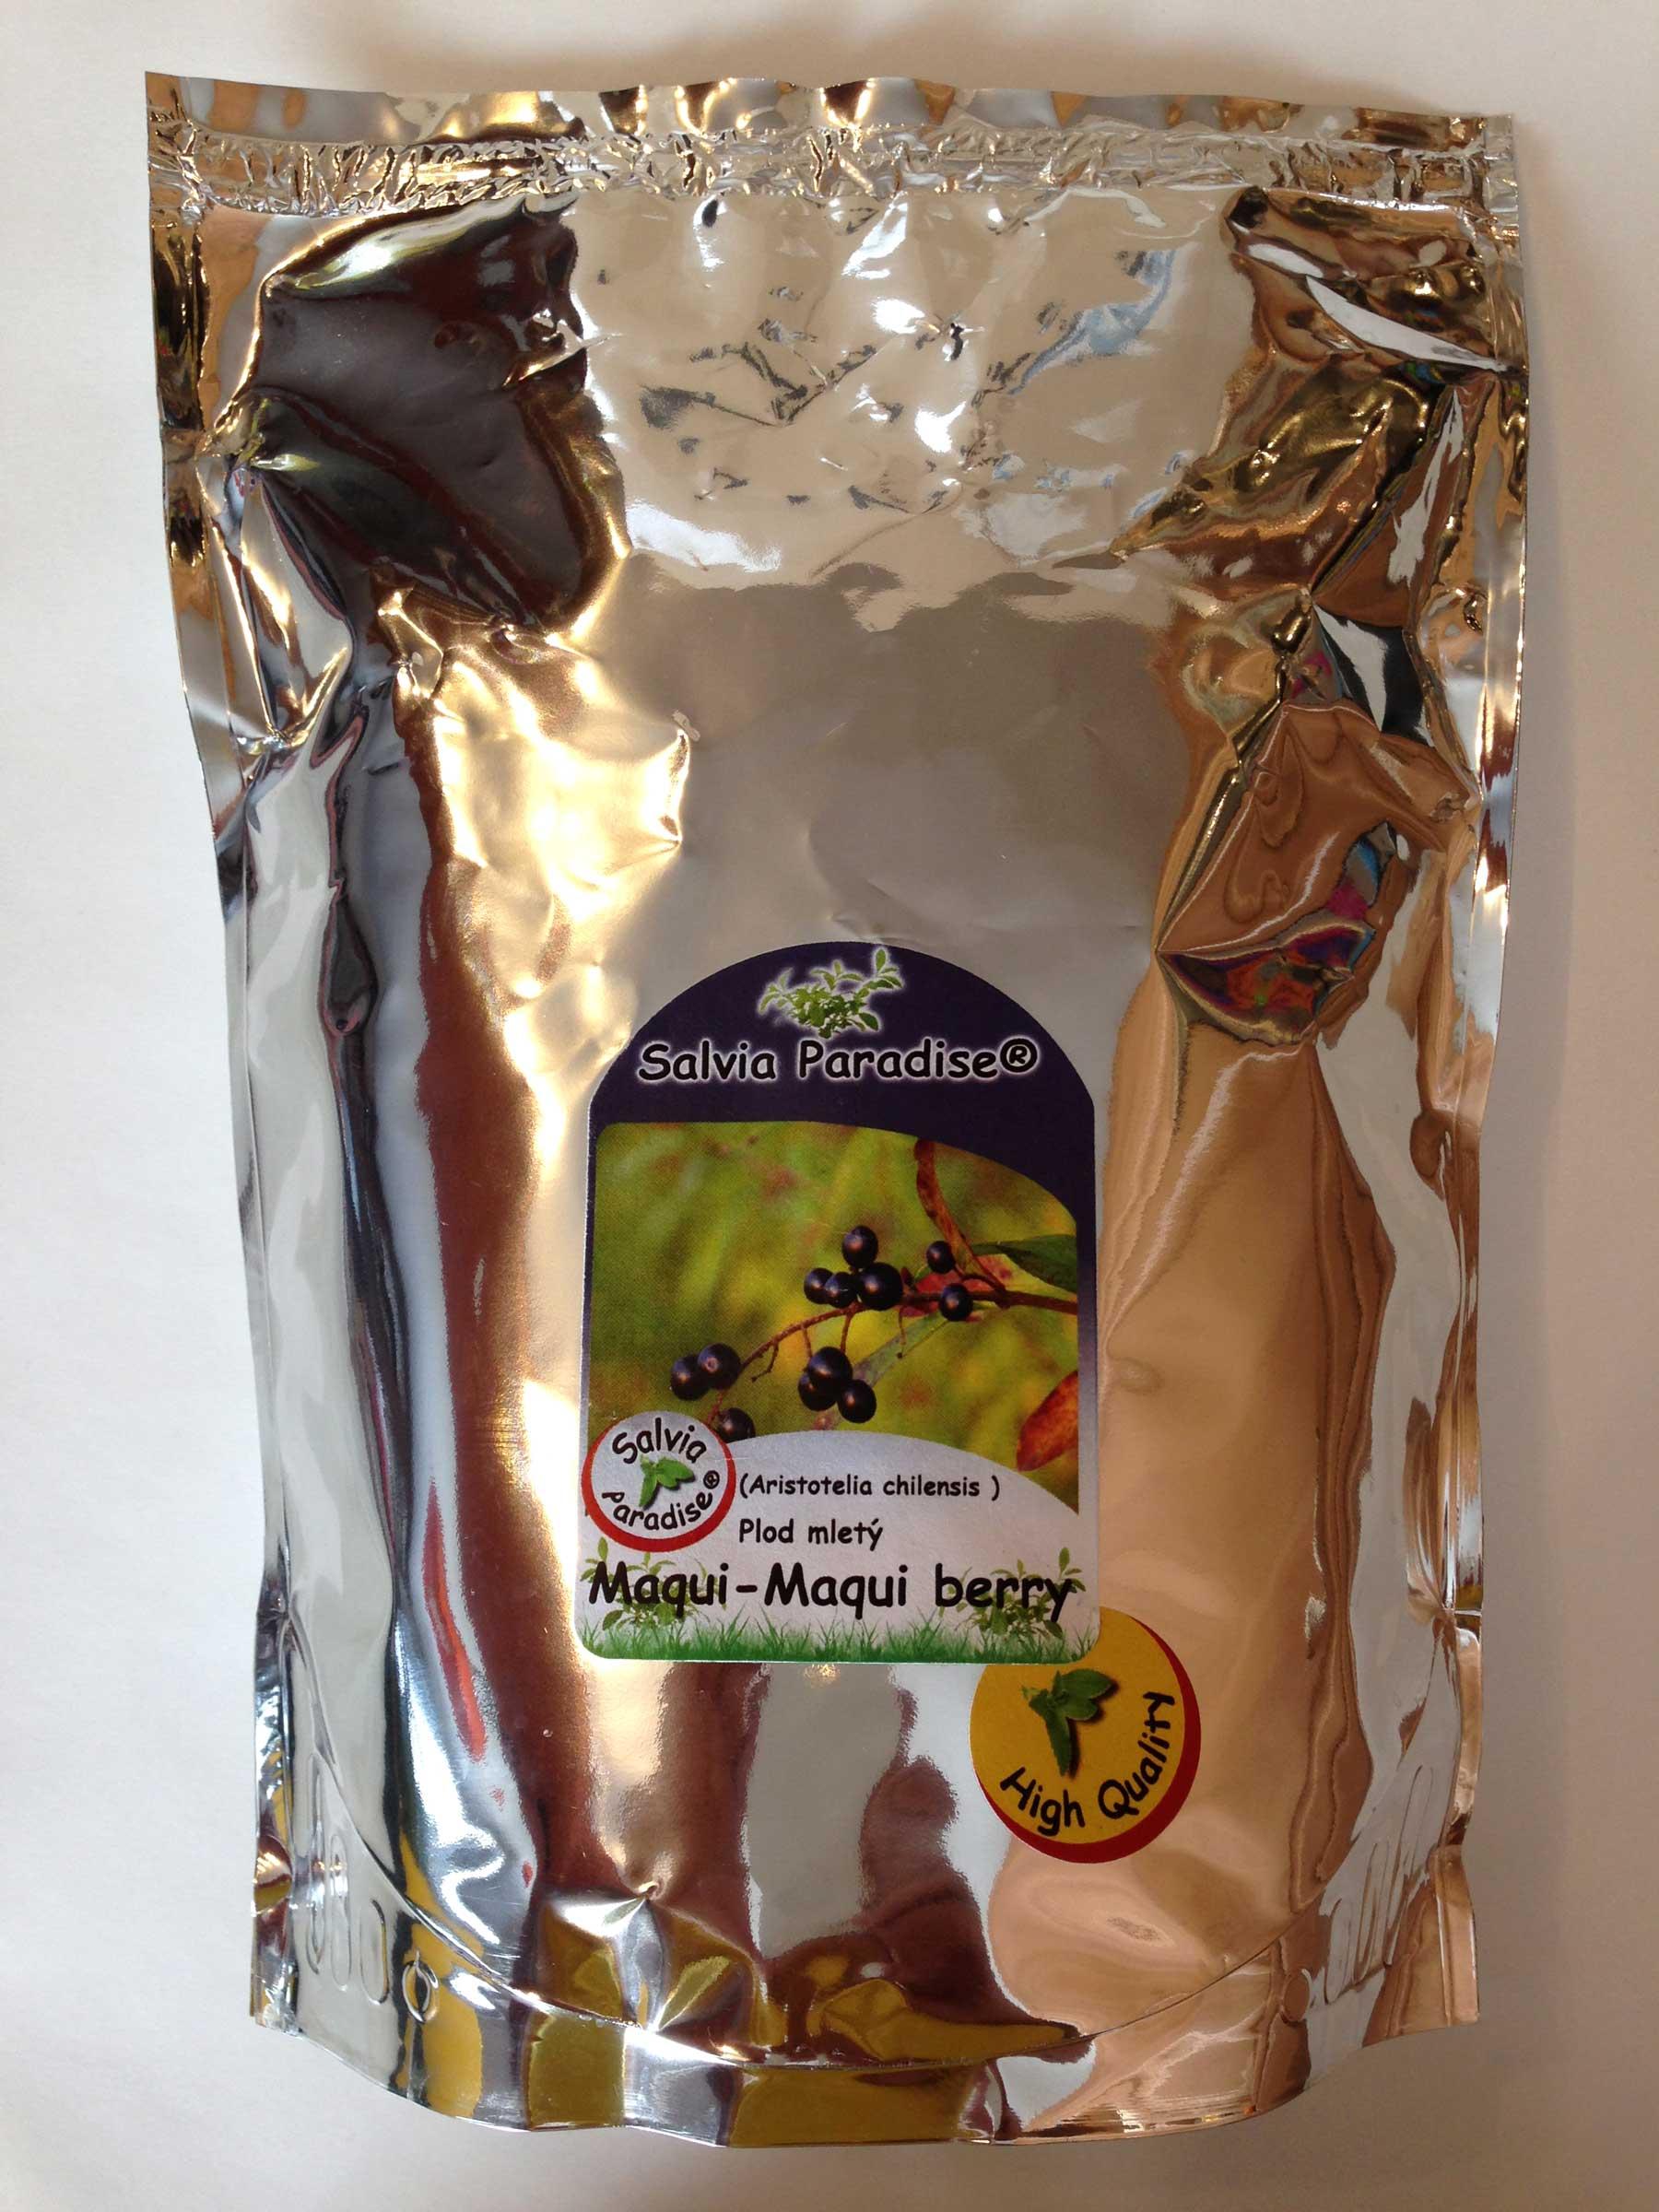 Salvia Paradise Maqui berry prášek, 50g